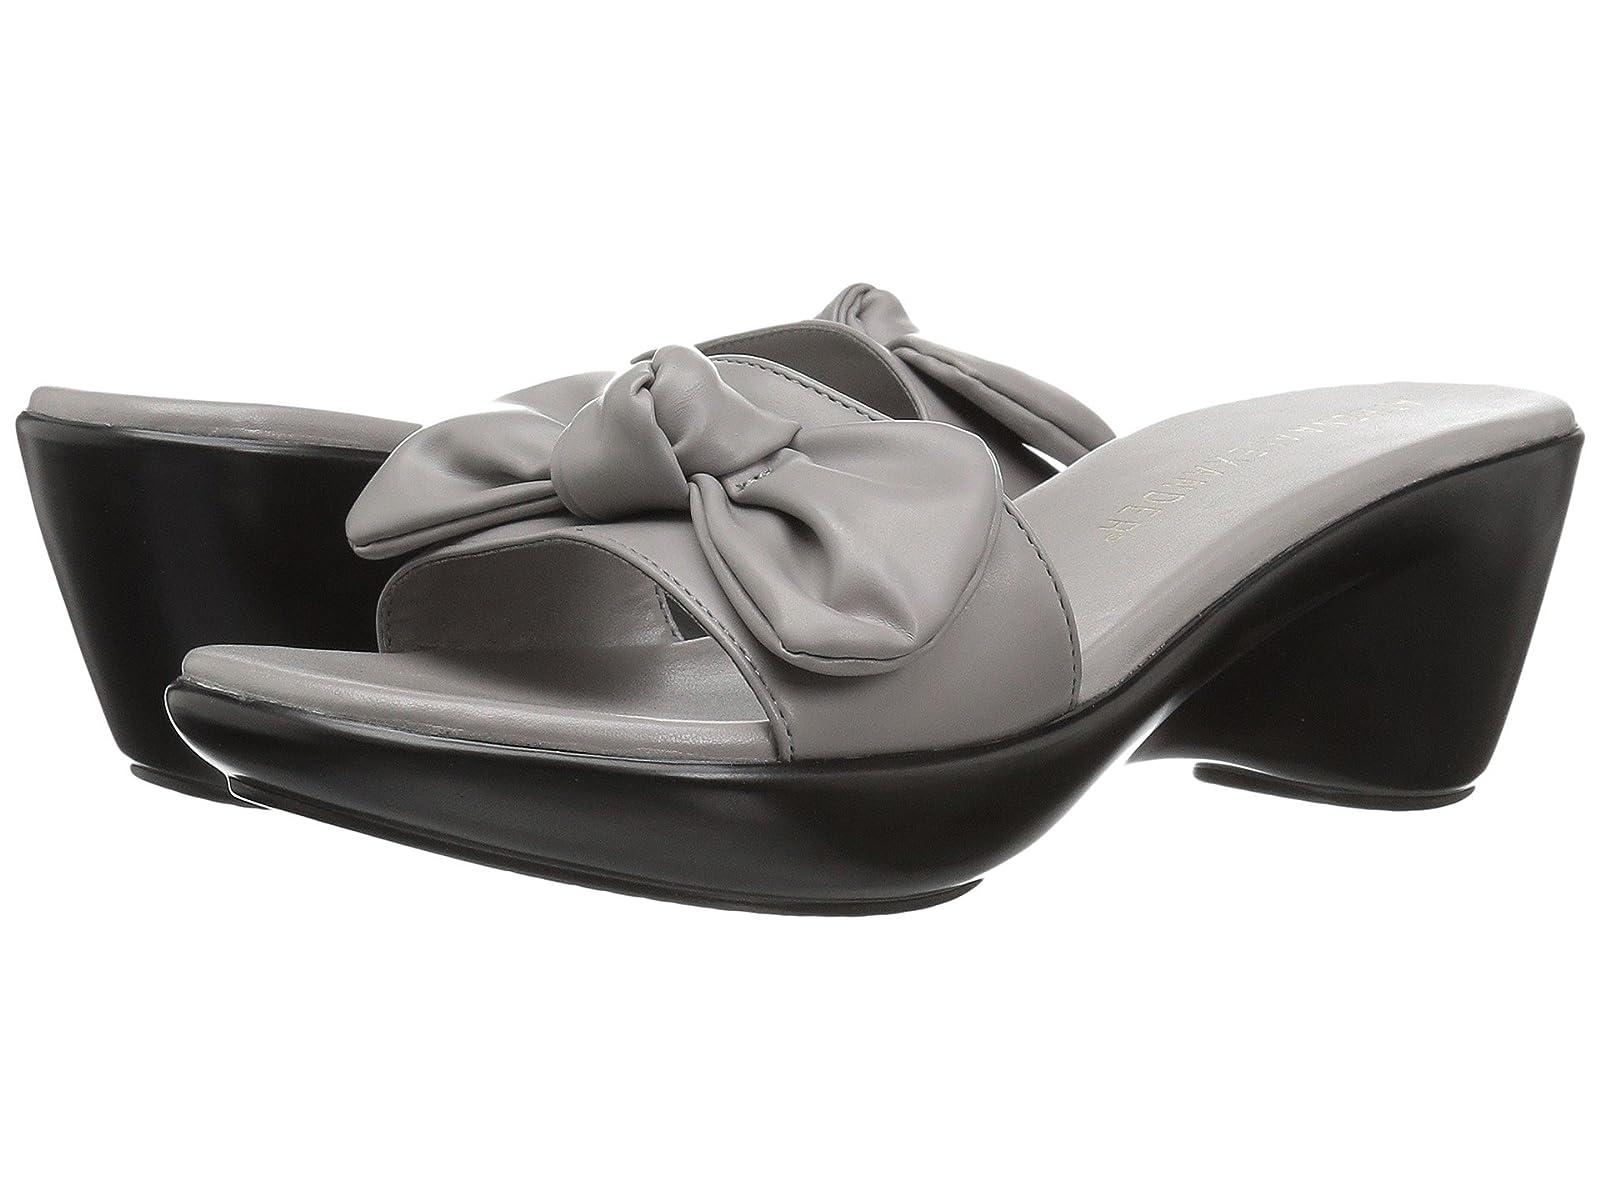 Athena Alexander PattyeCheap and distinctive eye-catching shoes